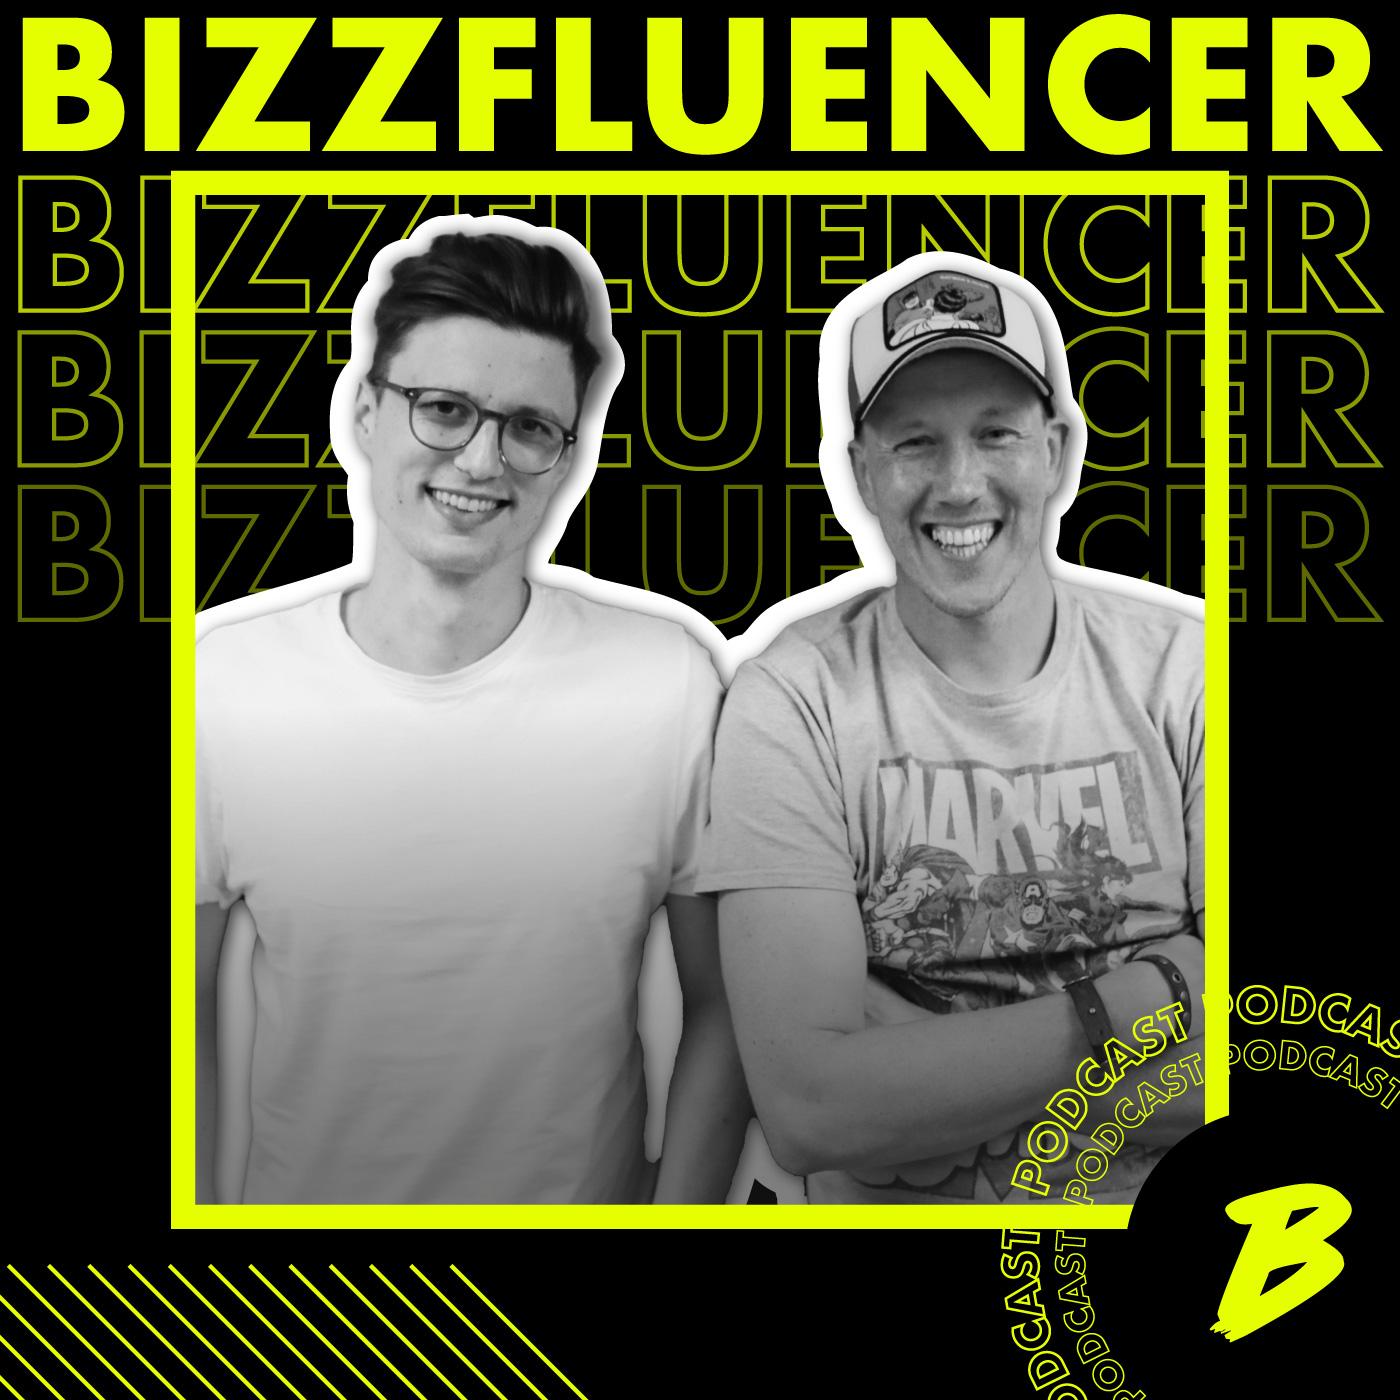 BIZZfluencer - Teaser